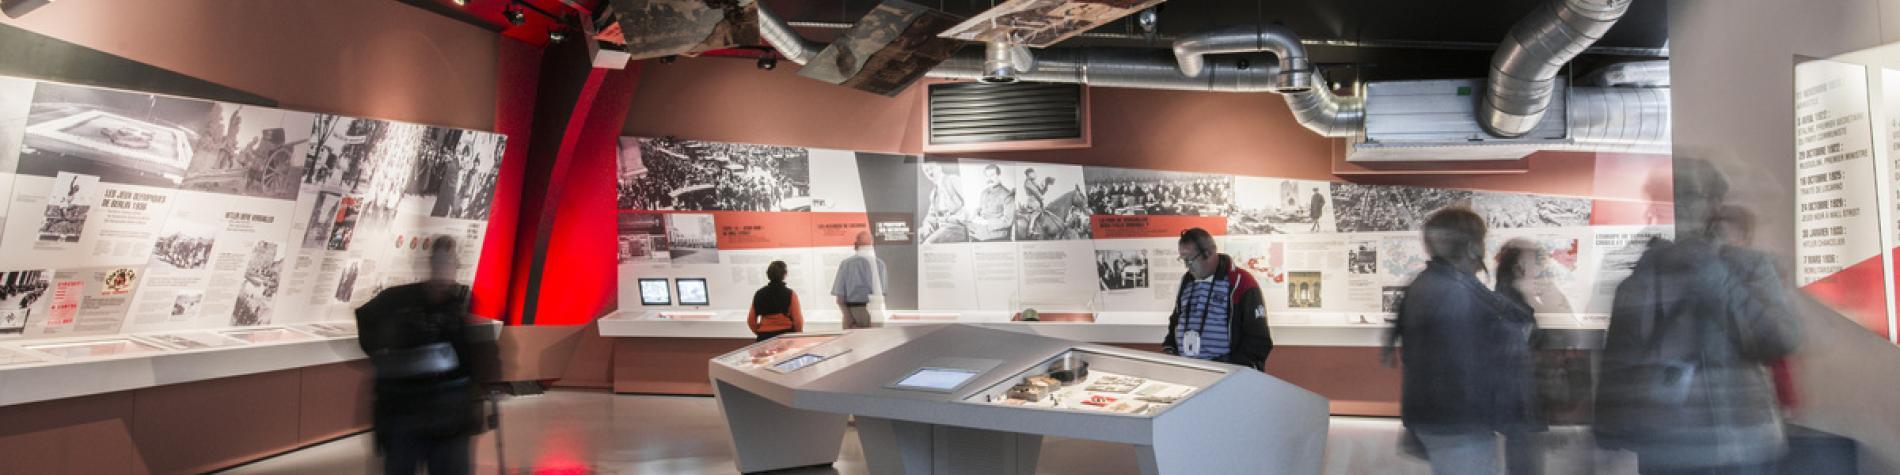 Bastogne War Museum (c)Tempora